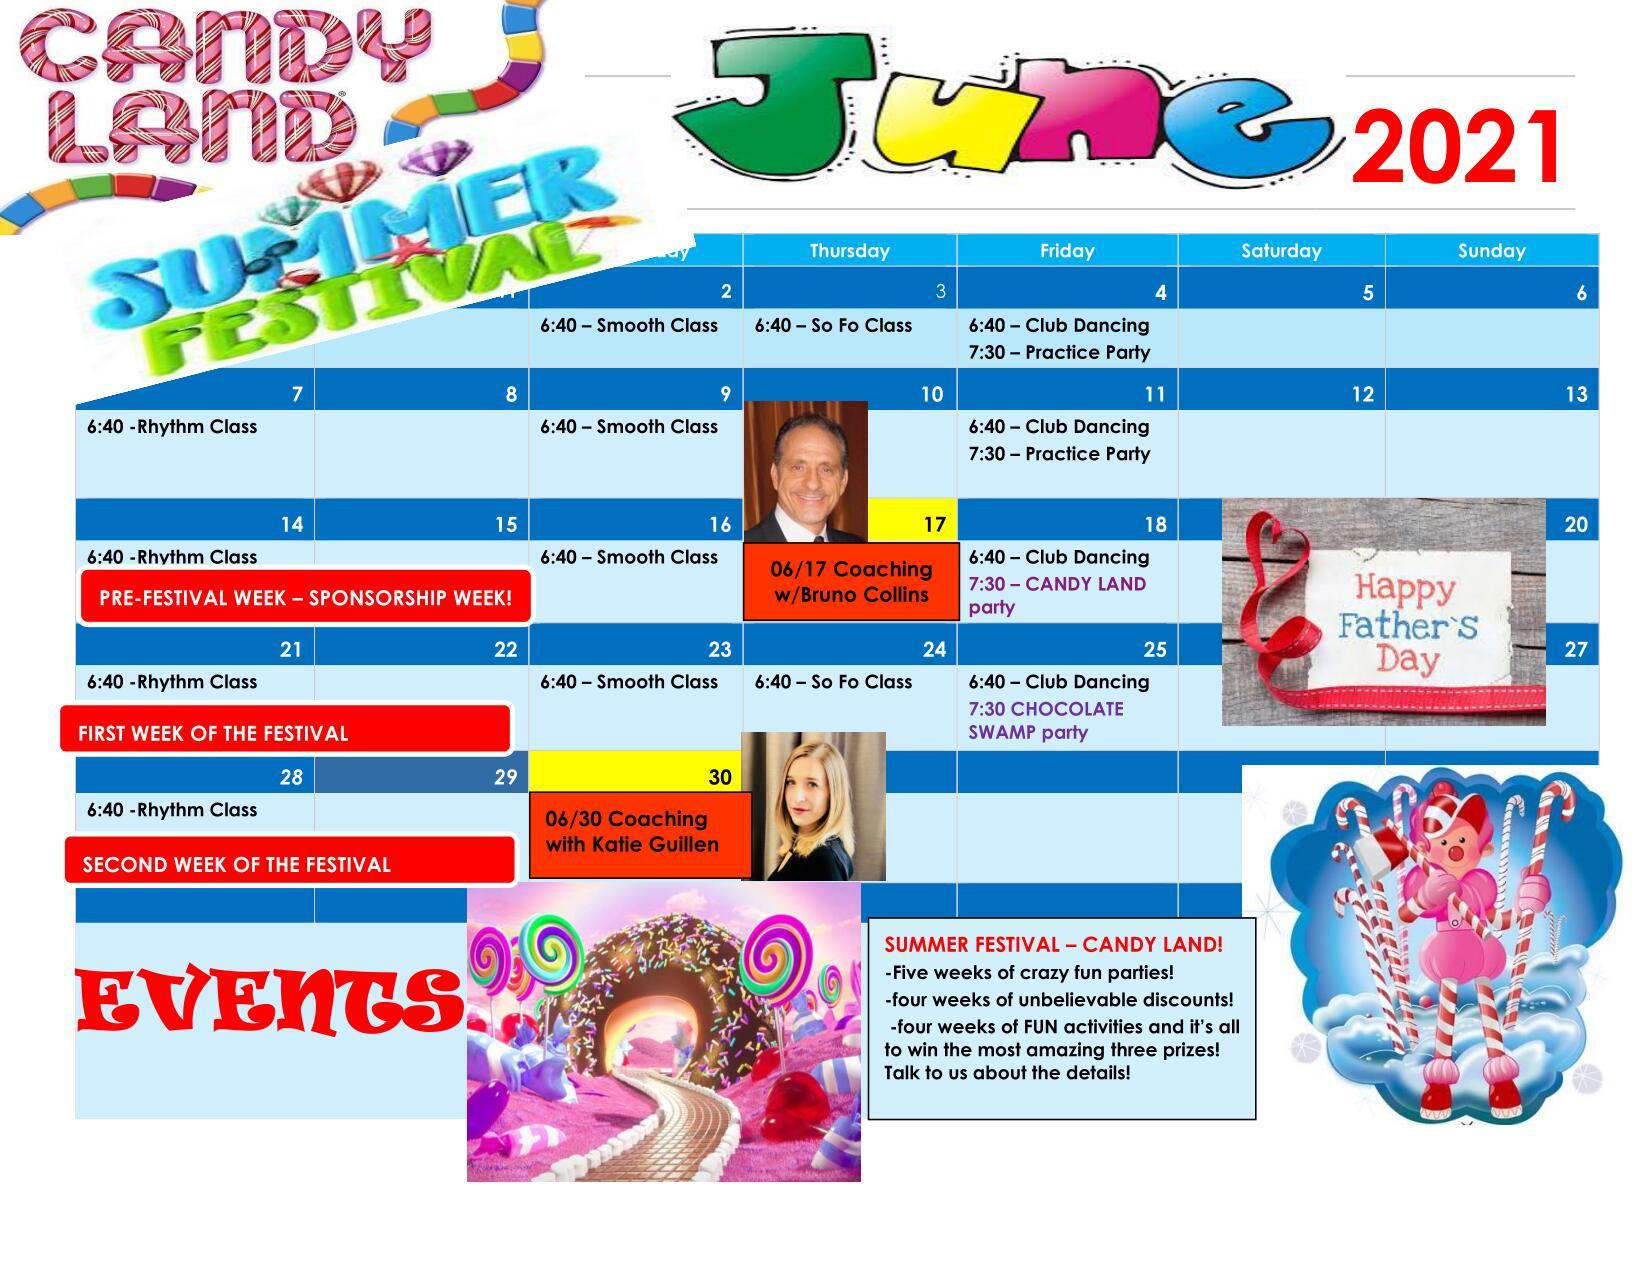 Download our June 2021 Dancing Calendar here!